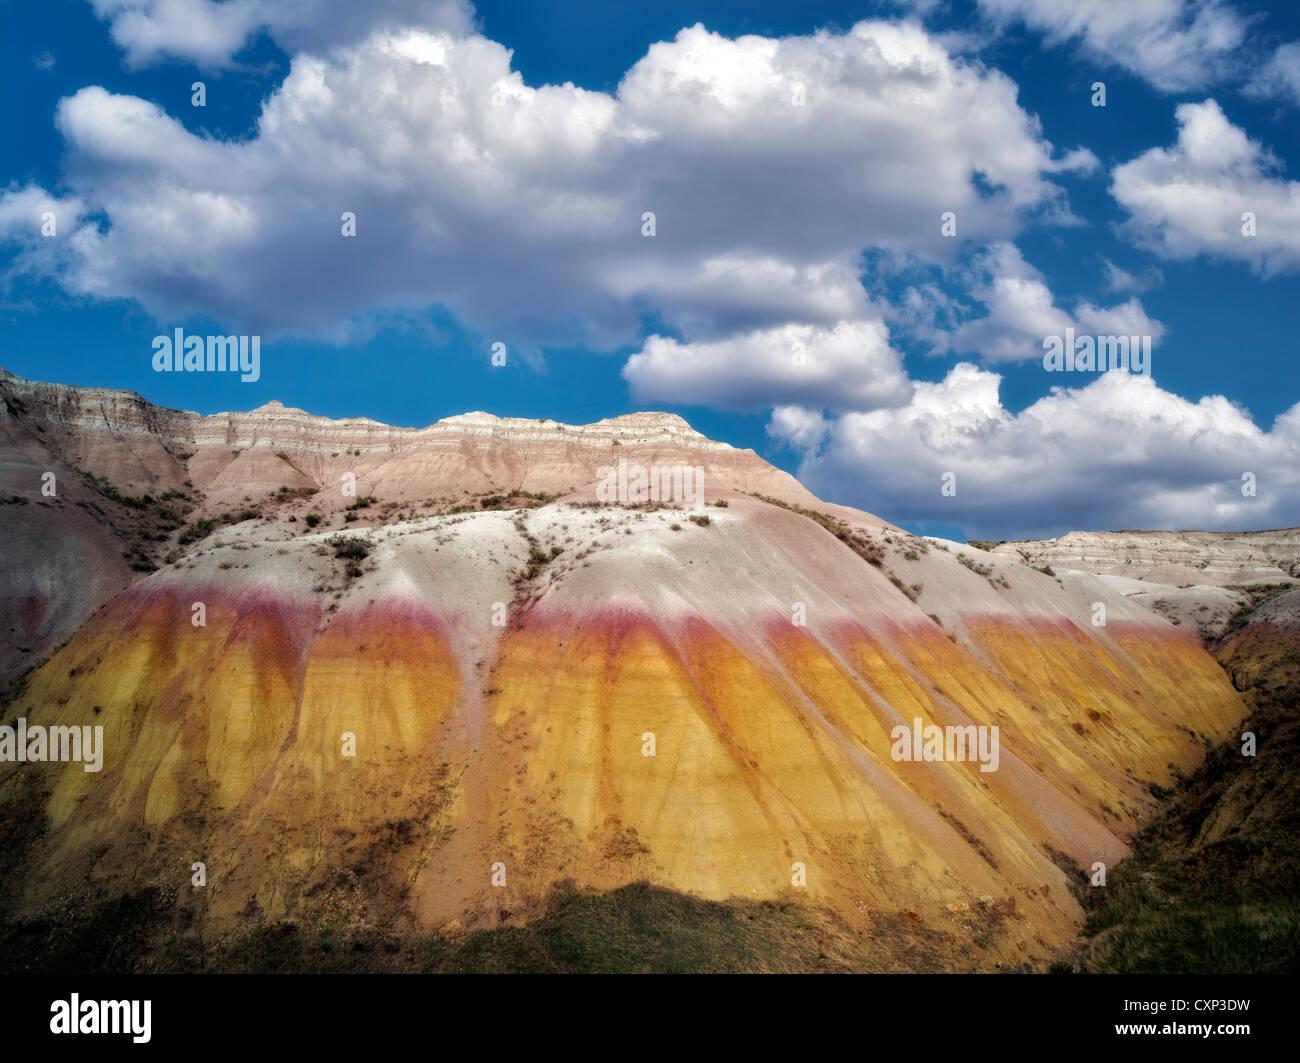 Yellow Mounds with clouds. Badlands National Park, South Dakota. - Stock Image